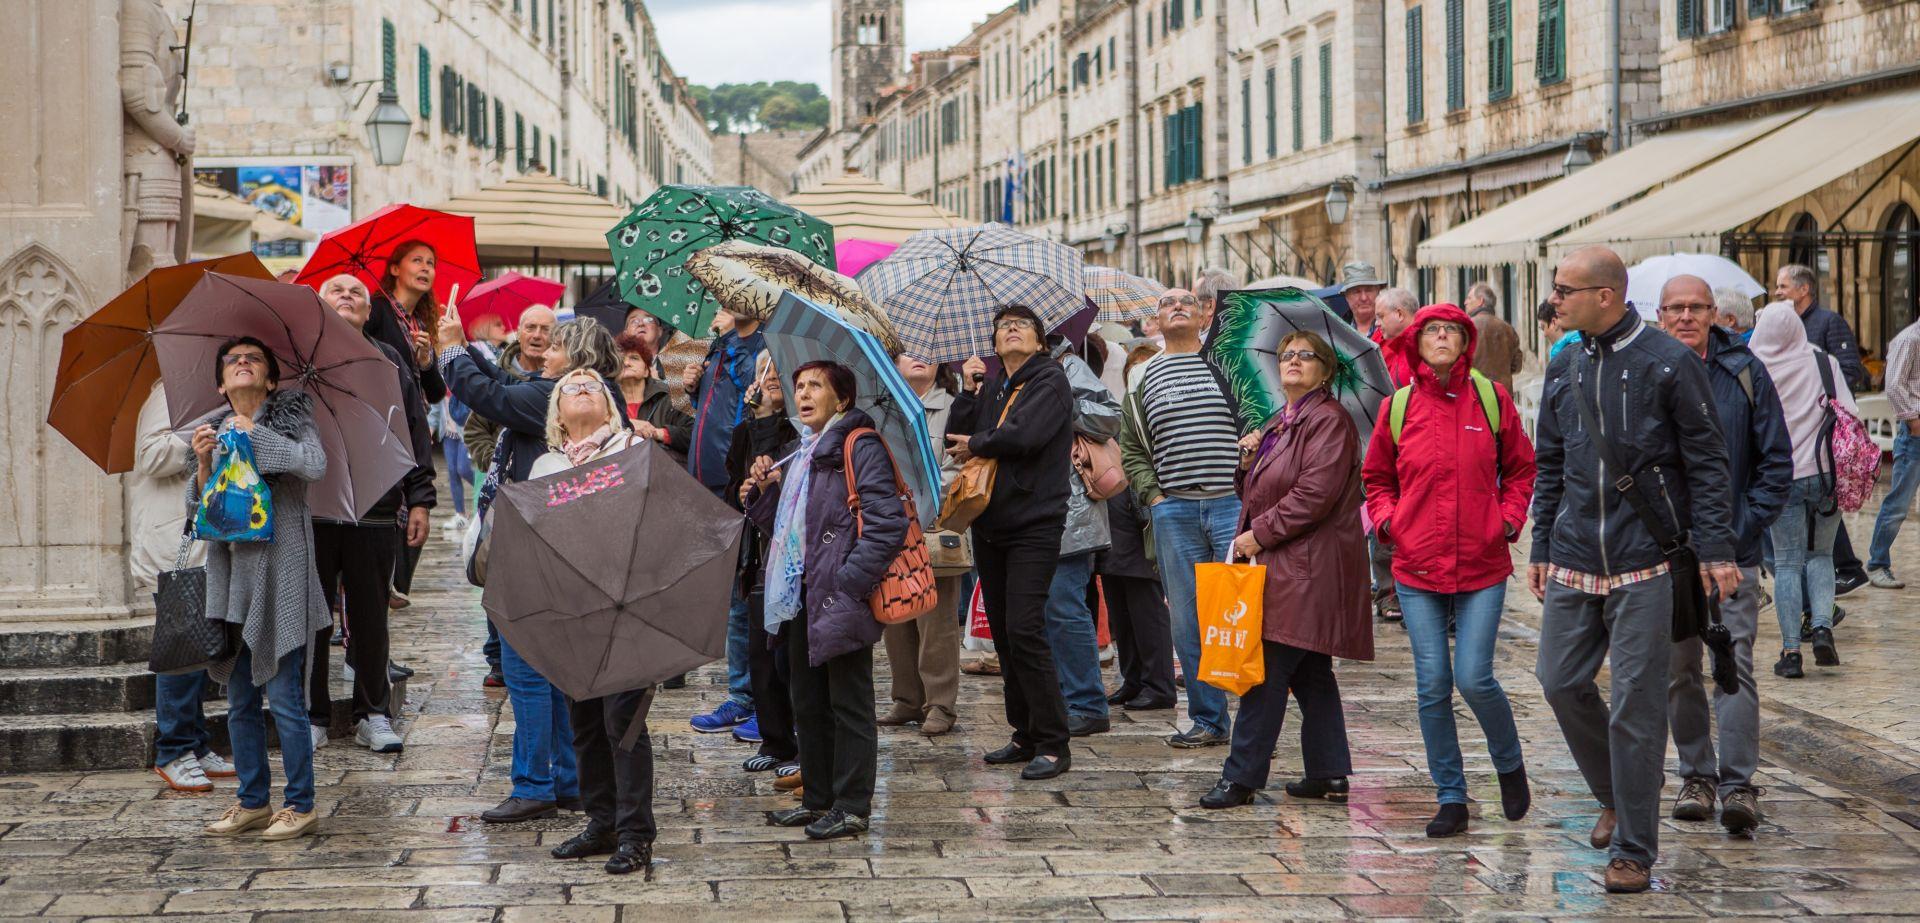 DZS: U listopadu 13,2 posto više turista i 16 posto više noćenja